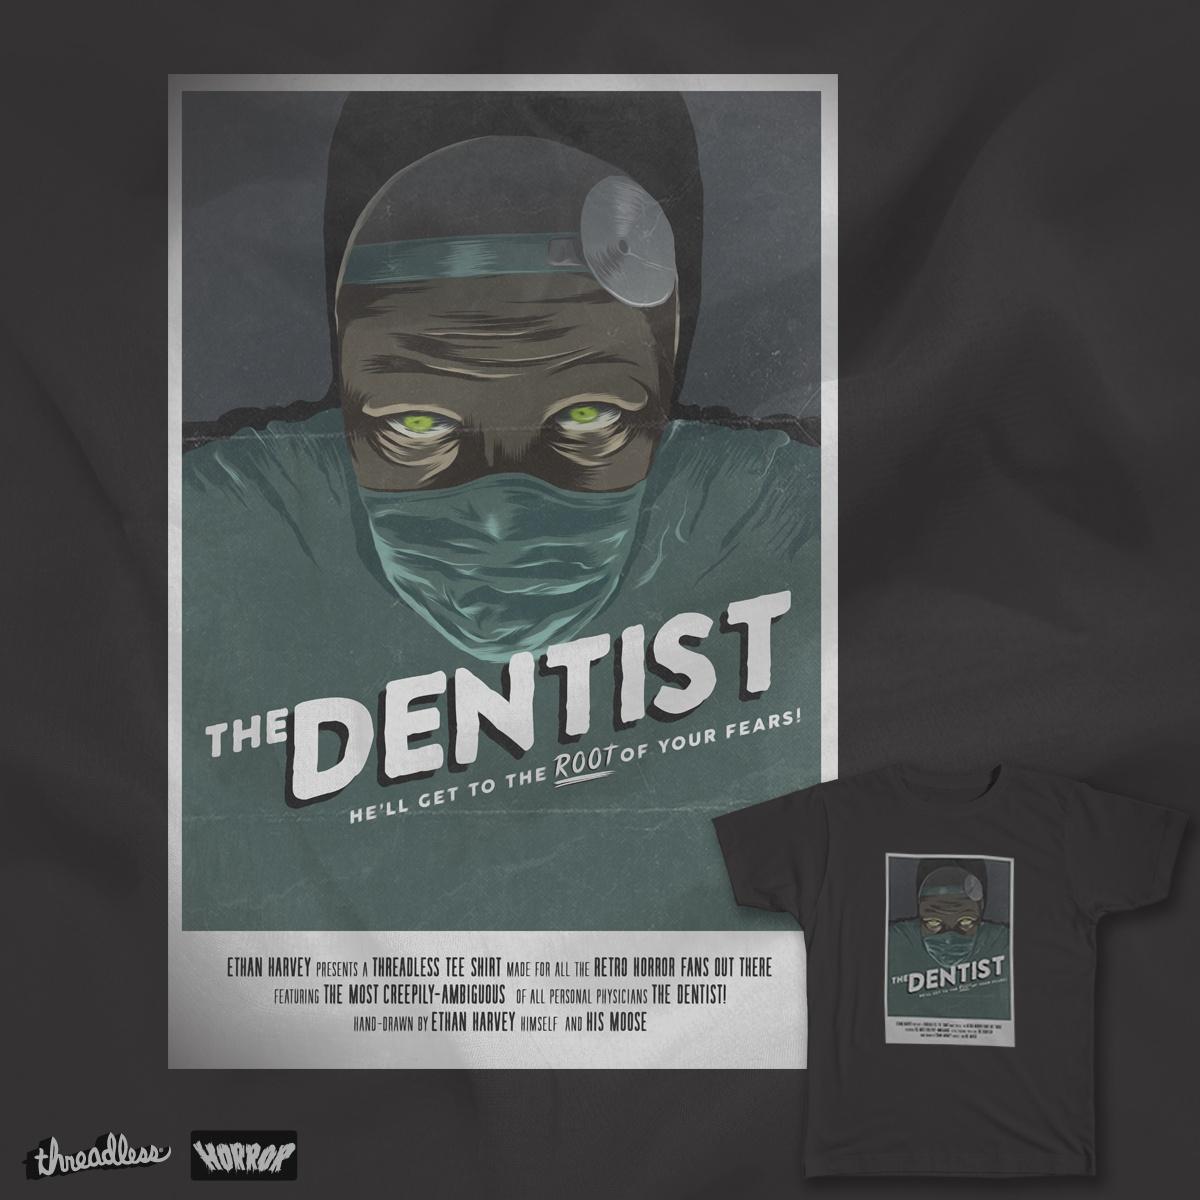 THE DENTIST! by EthanHarvey on Threadless